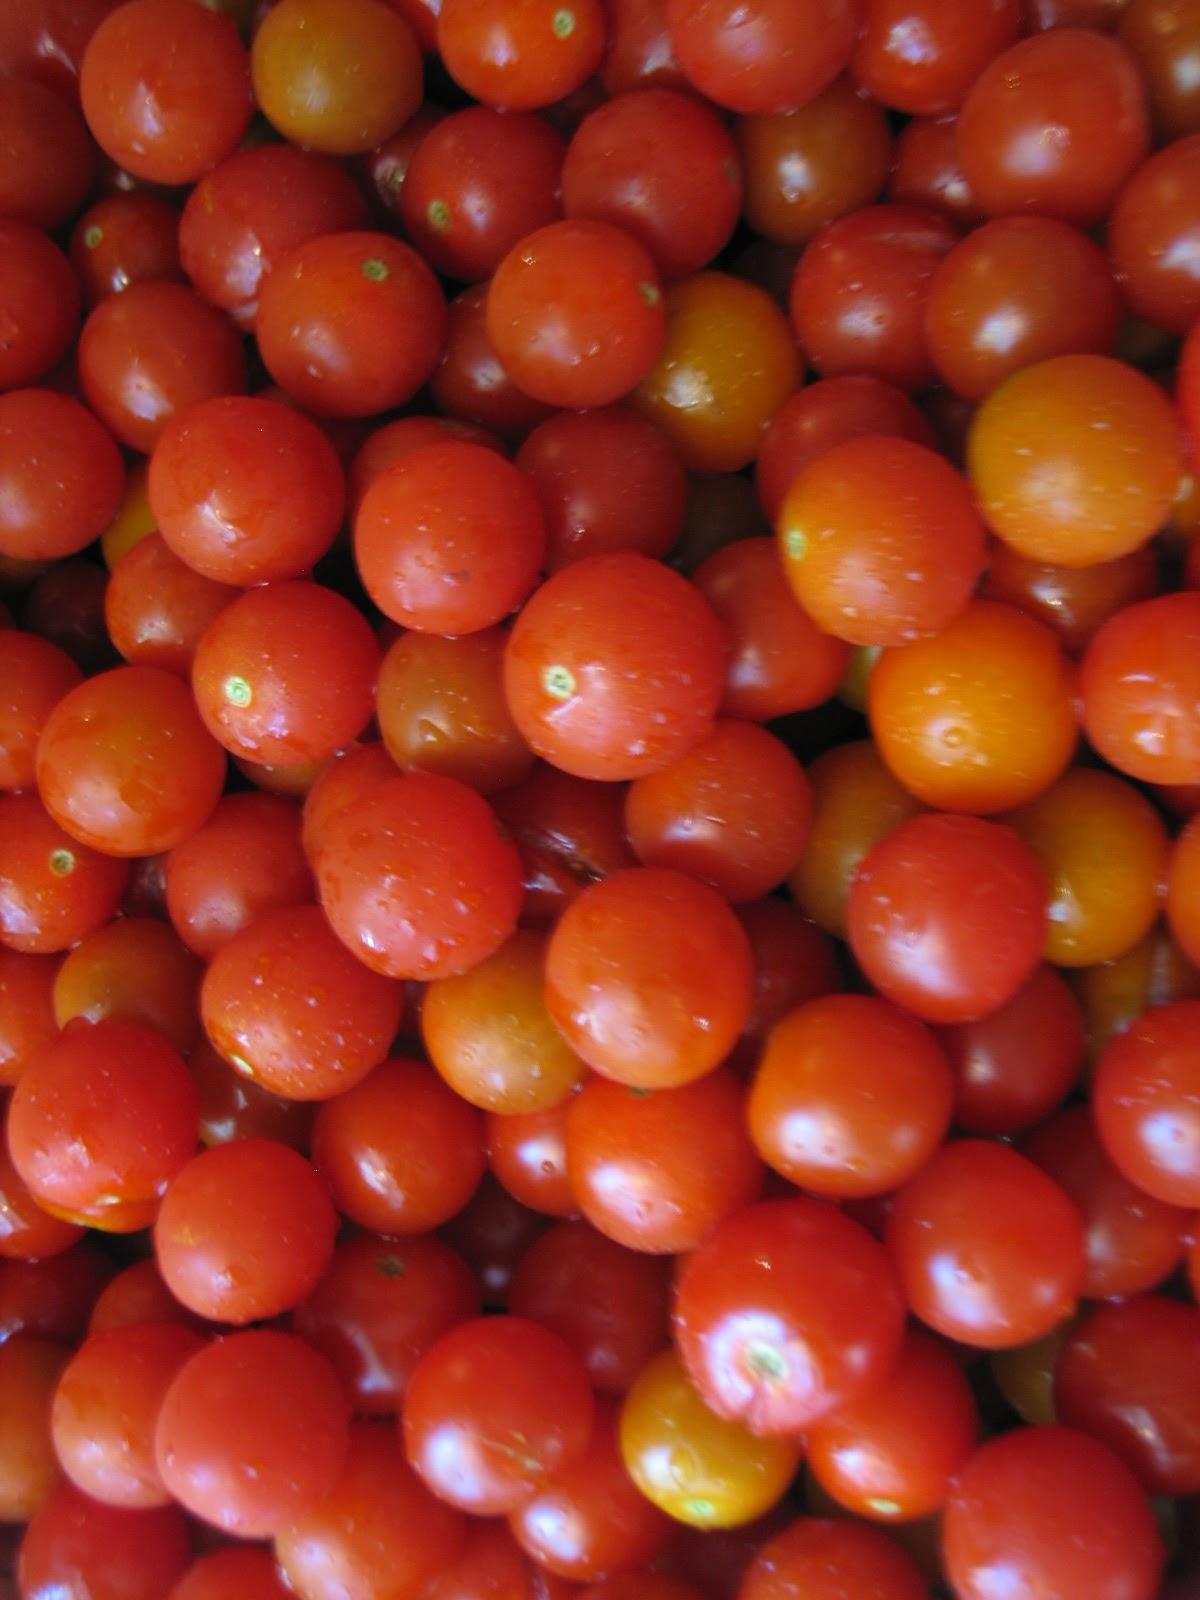 Breakfast Projekt: Tomato, Spinach and Feta Baked Eggs